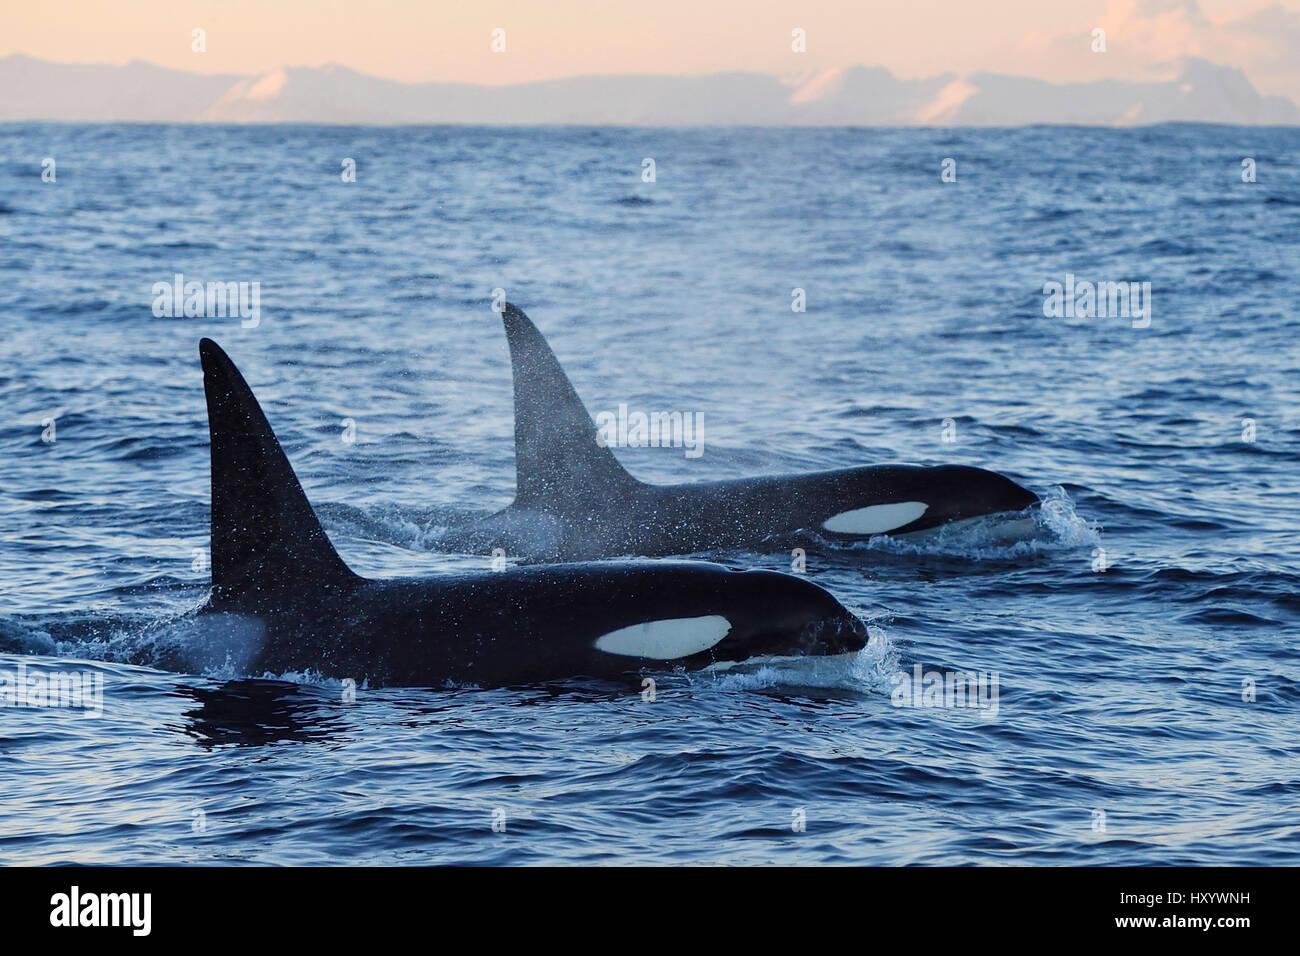 Two Orcas / Killer whales (Orcinus orca) surfacing, Senja, Troms County, Norway, Scandinavia, January. Cetaceans - Stock Image